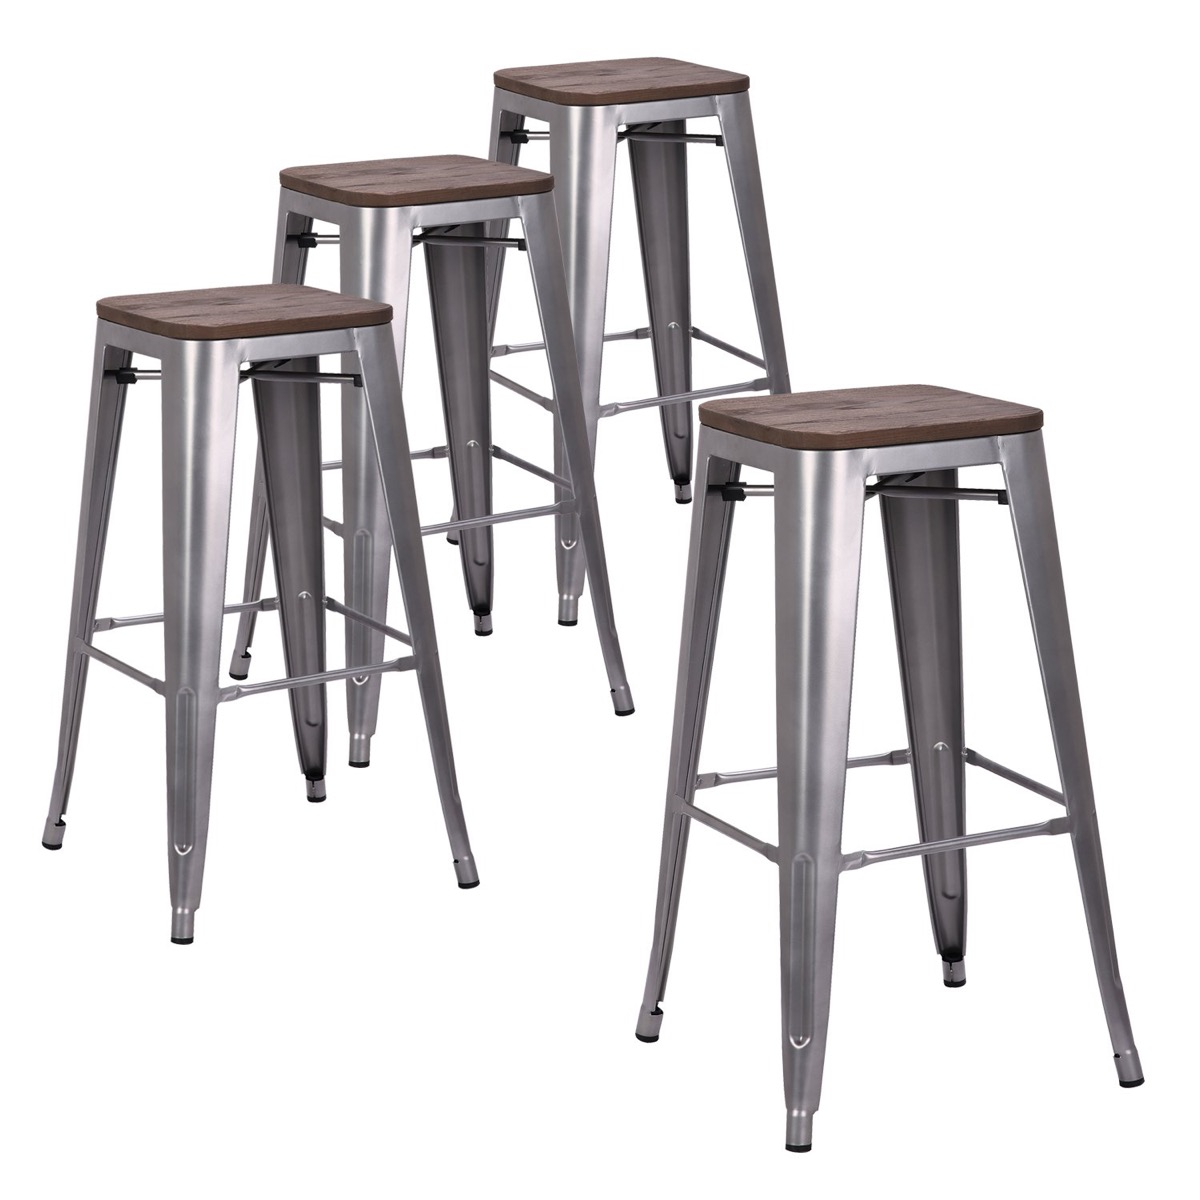 four metal bar stools, rustic farmhouse decor